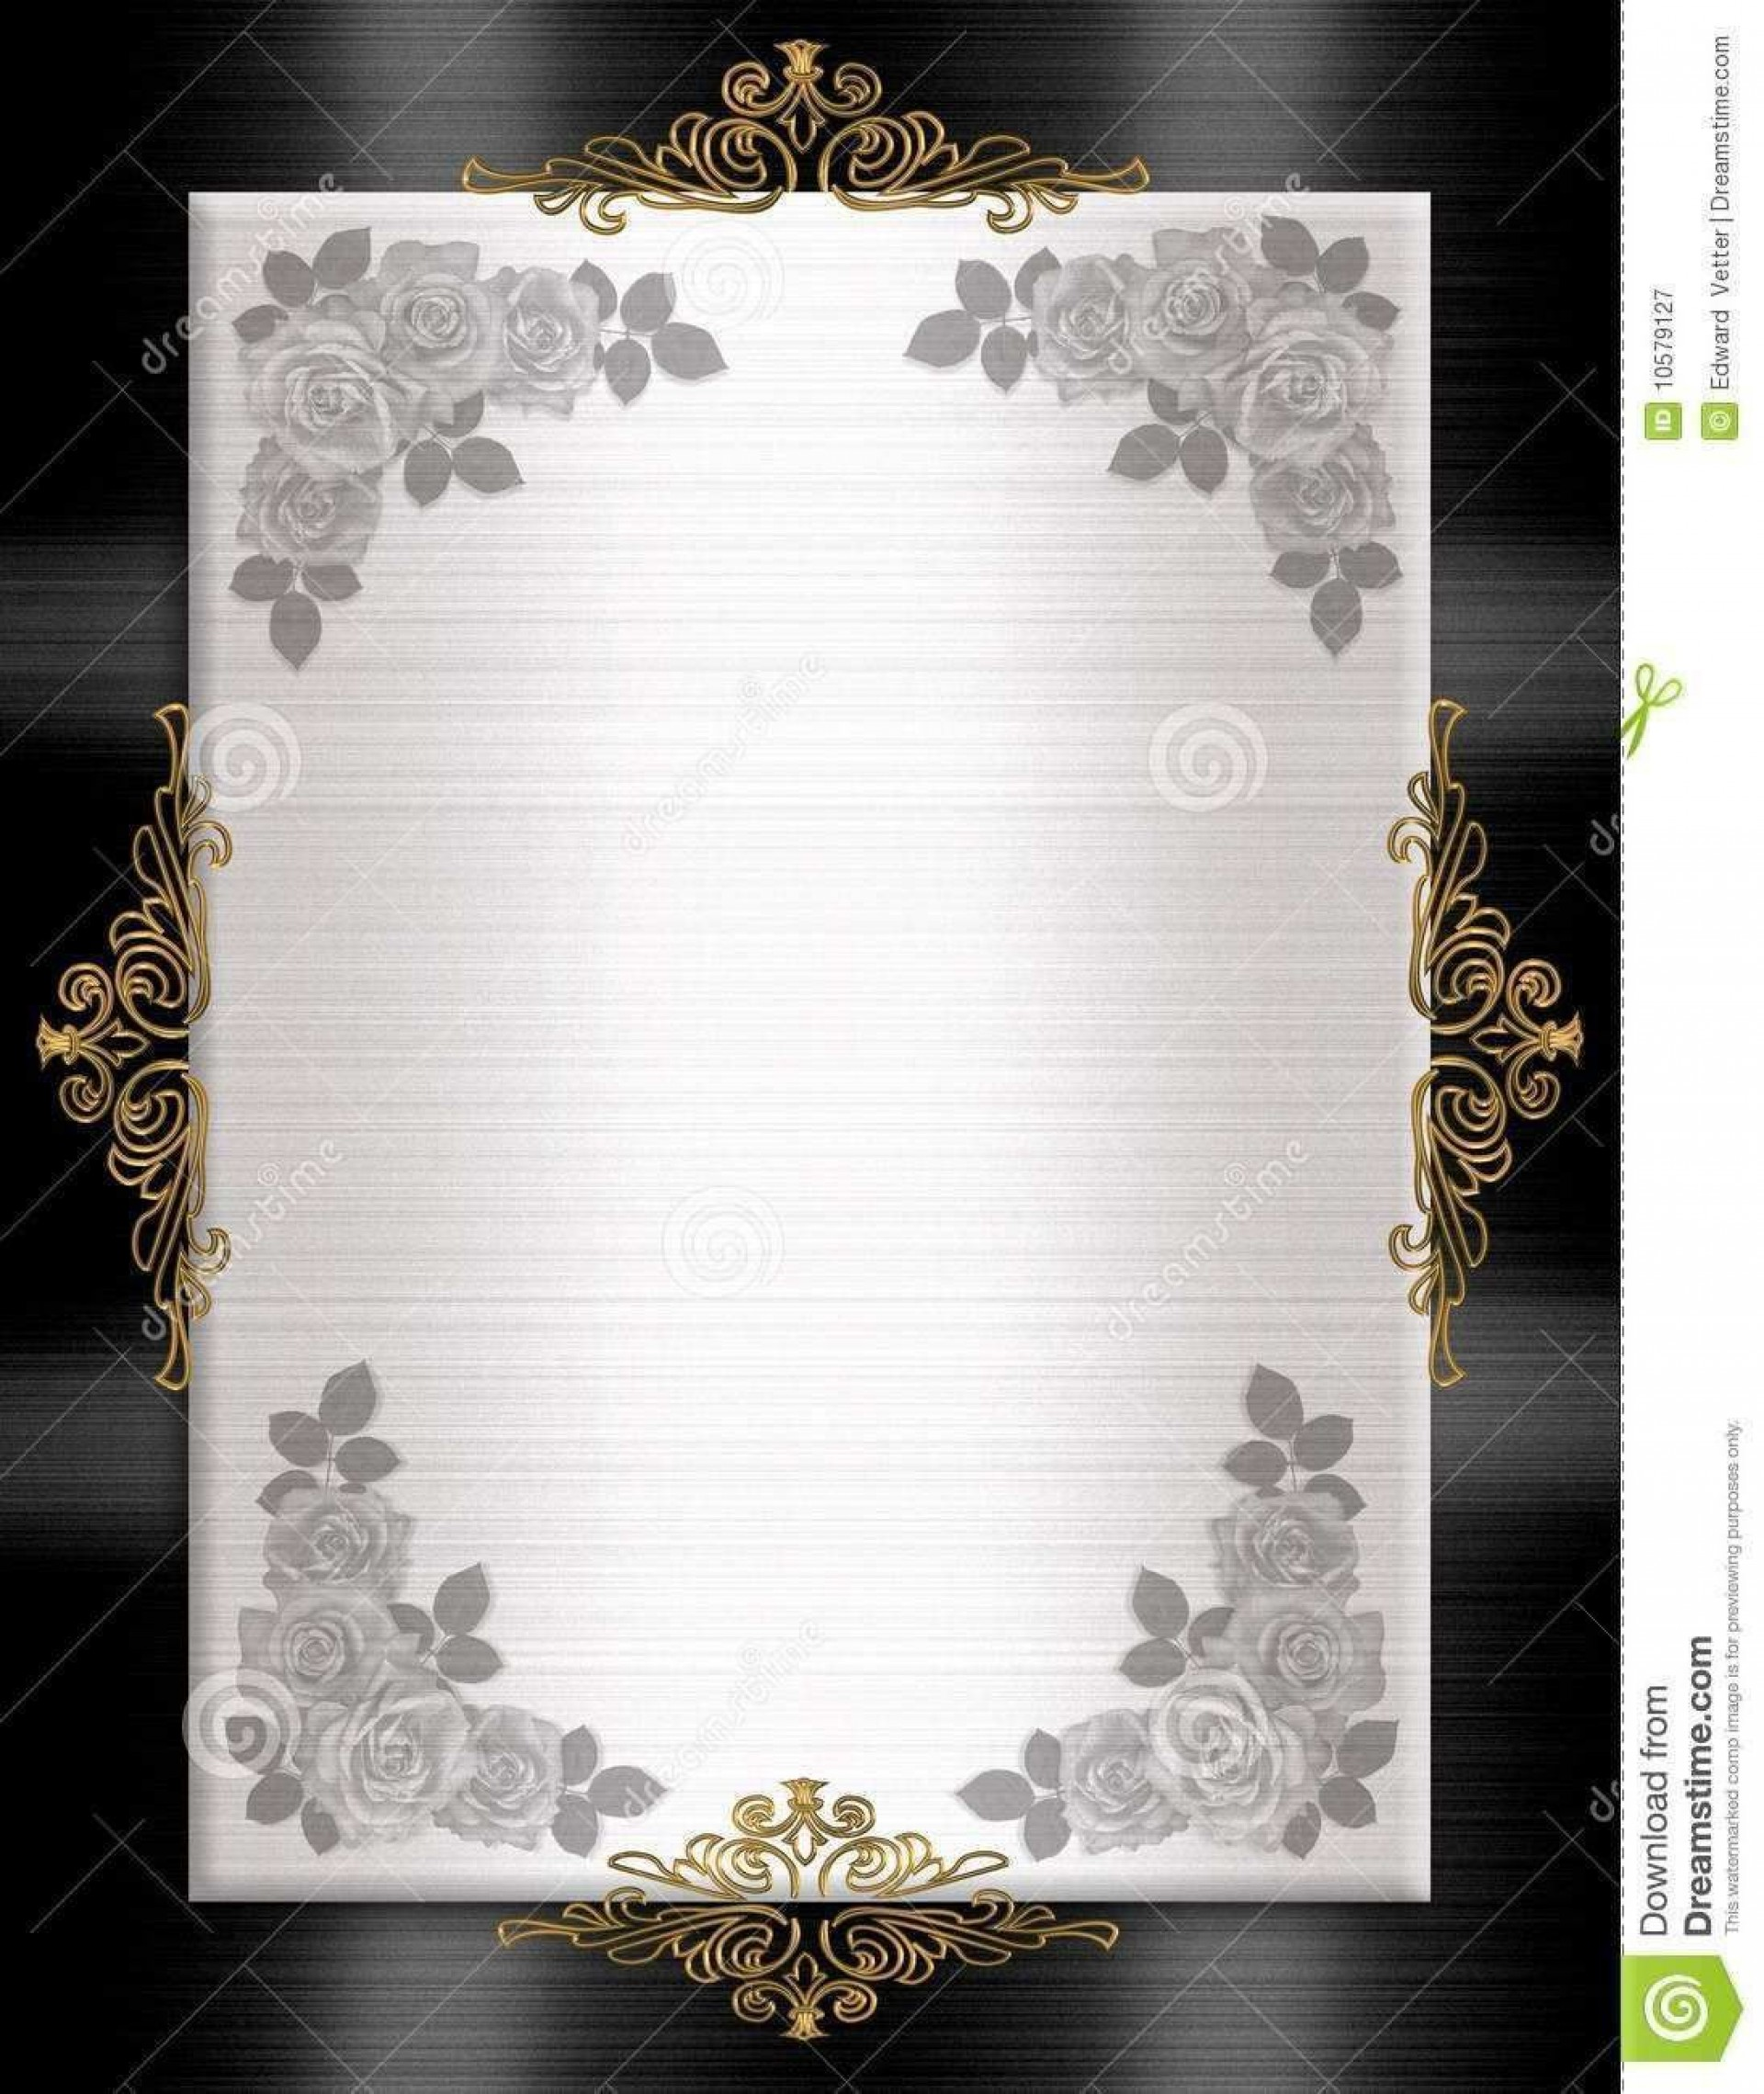 001 Wonderful Black And Gold Invitation Template Sample  Design White Free Printable1920